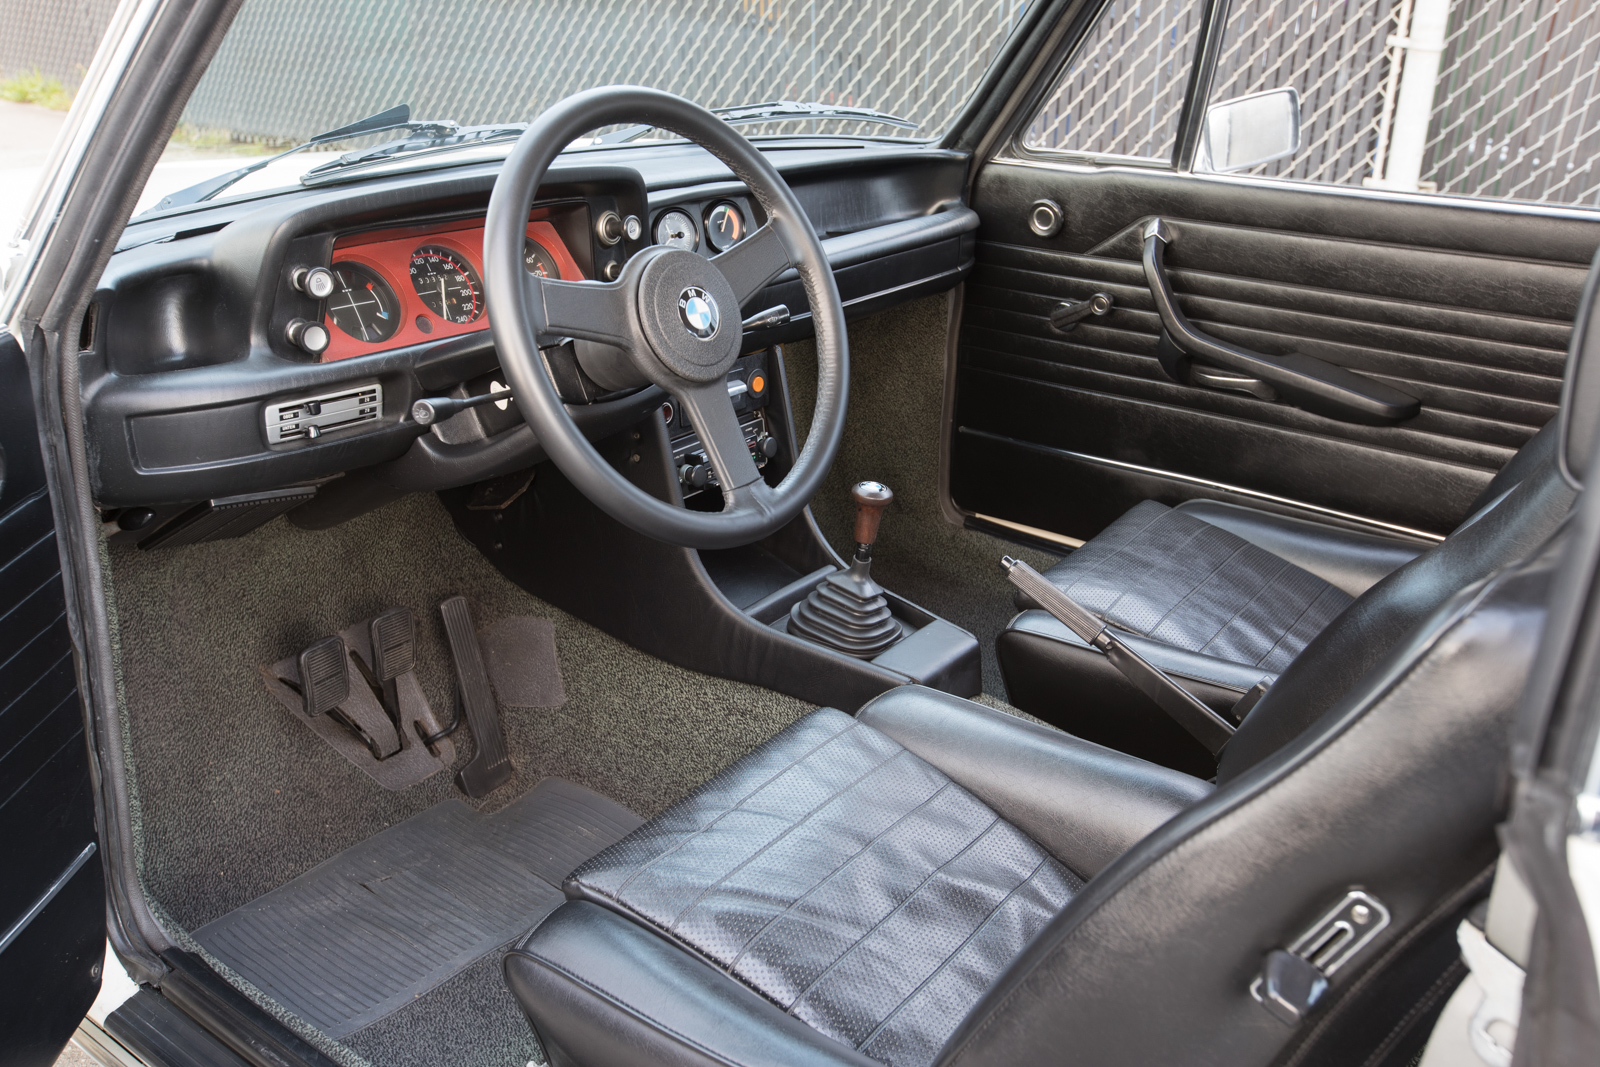 1974 BMW 2002 Turbo interior